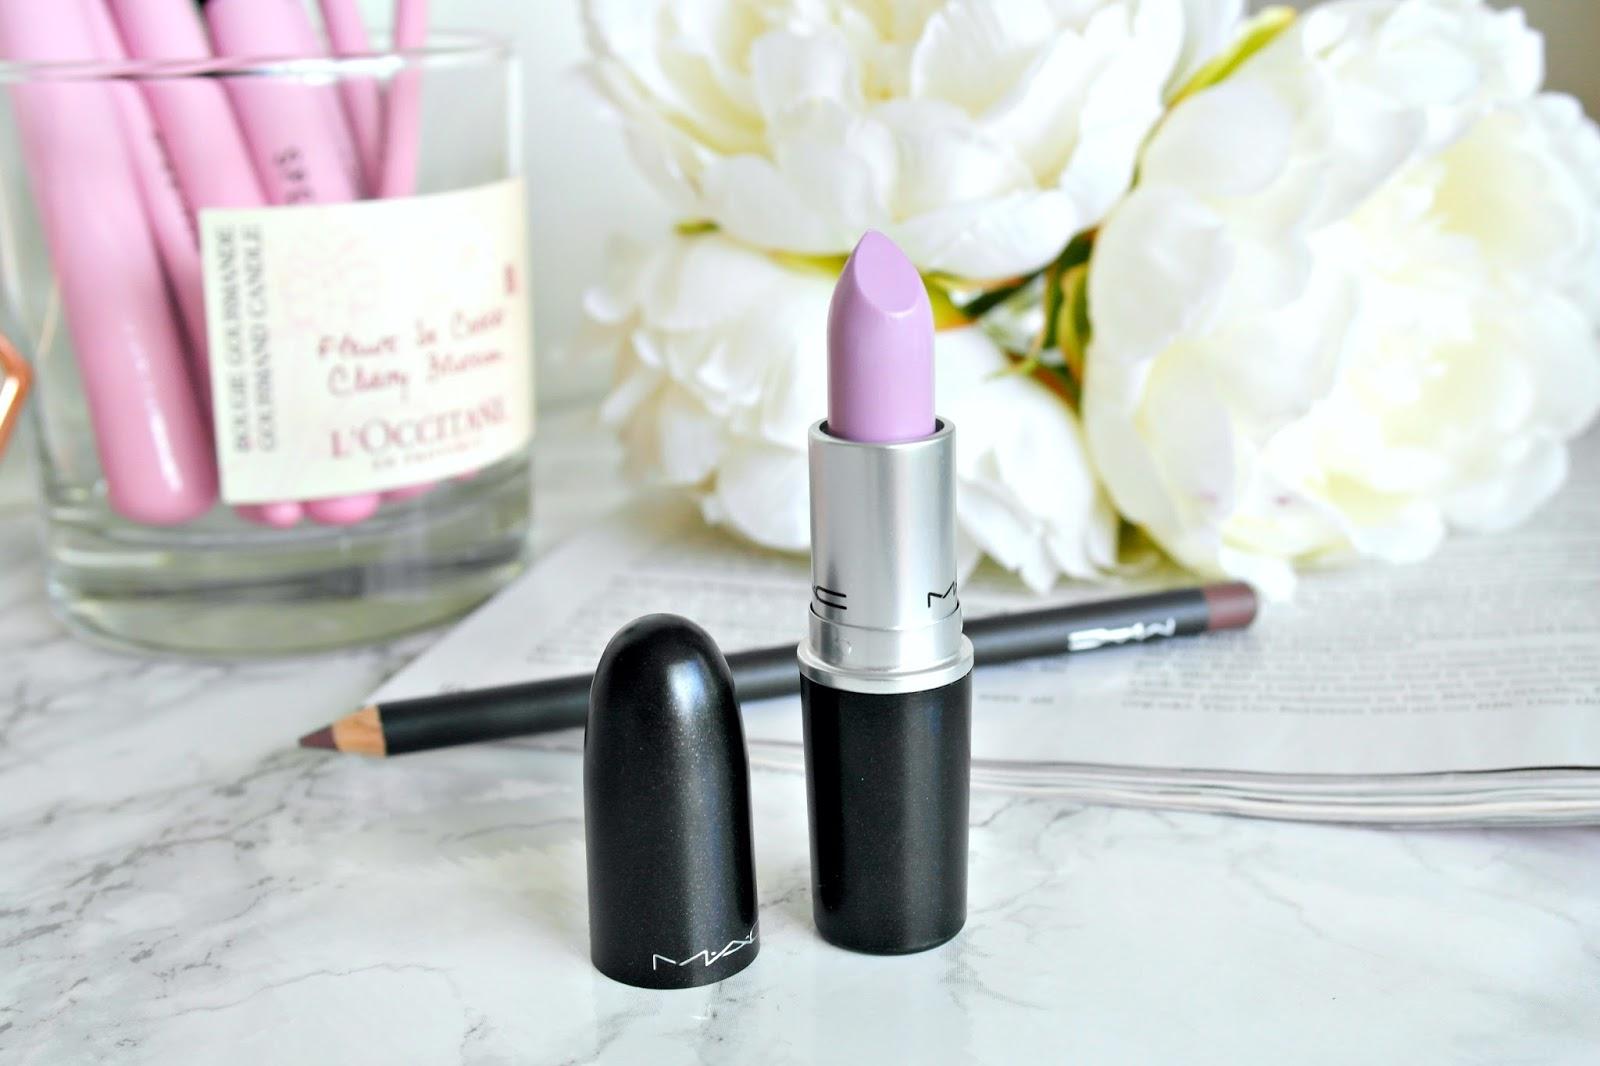 MAC Courting Seduction lipstick, MAC Stone lip liner